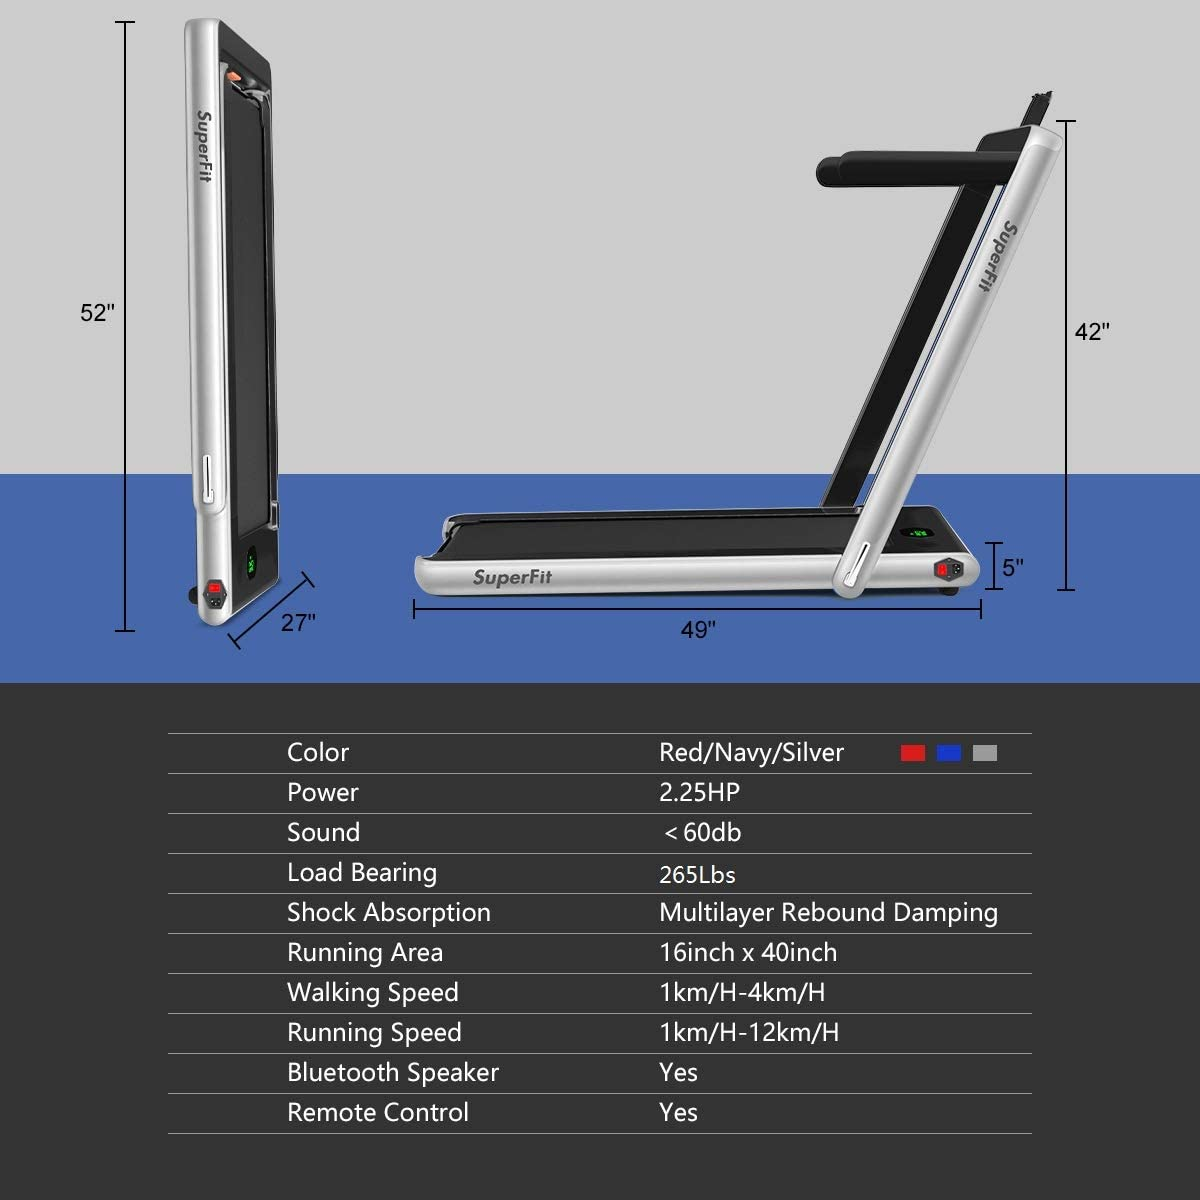 Goplus 2 in 1 Folding Treadmill, 2.25HP Under Desk Electric Treadmill